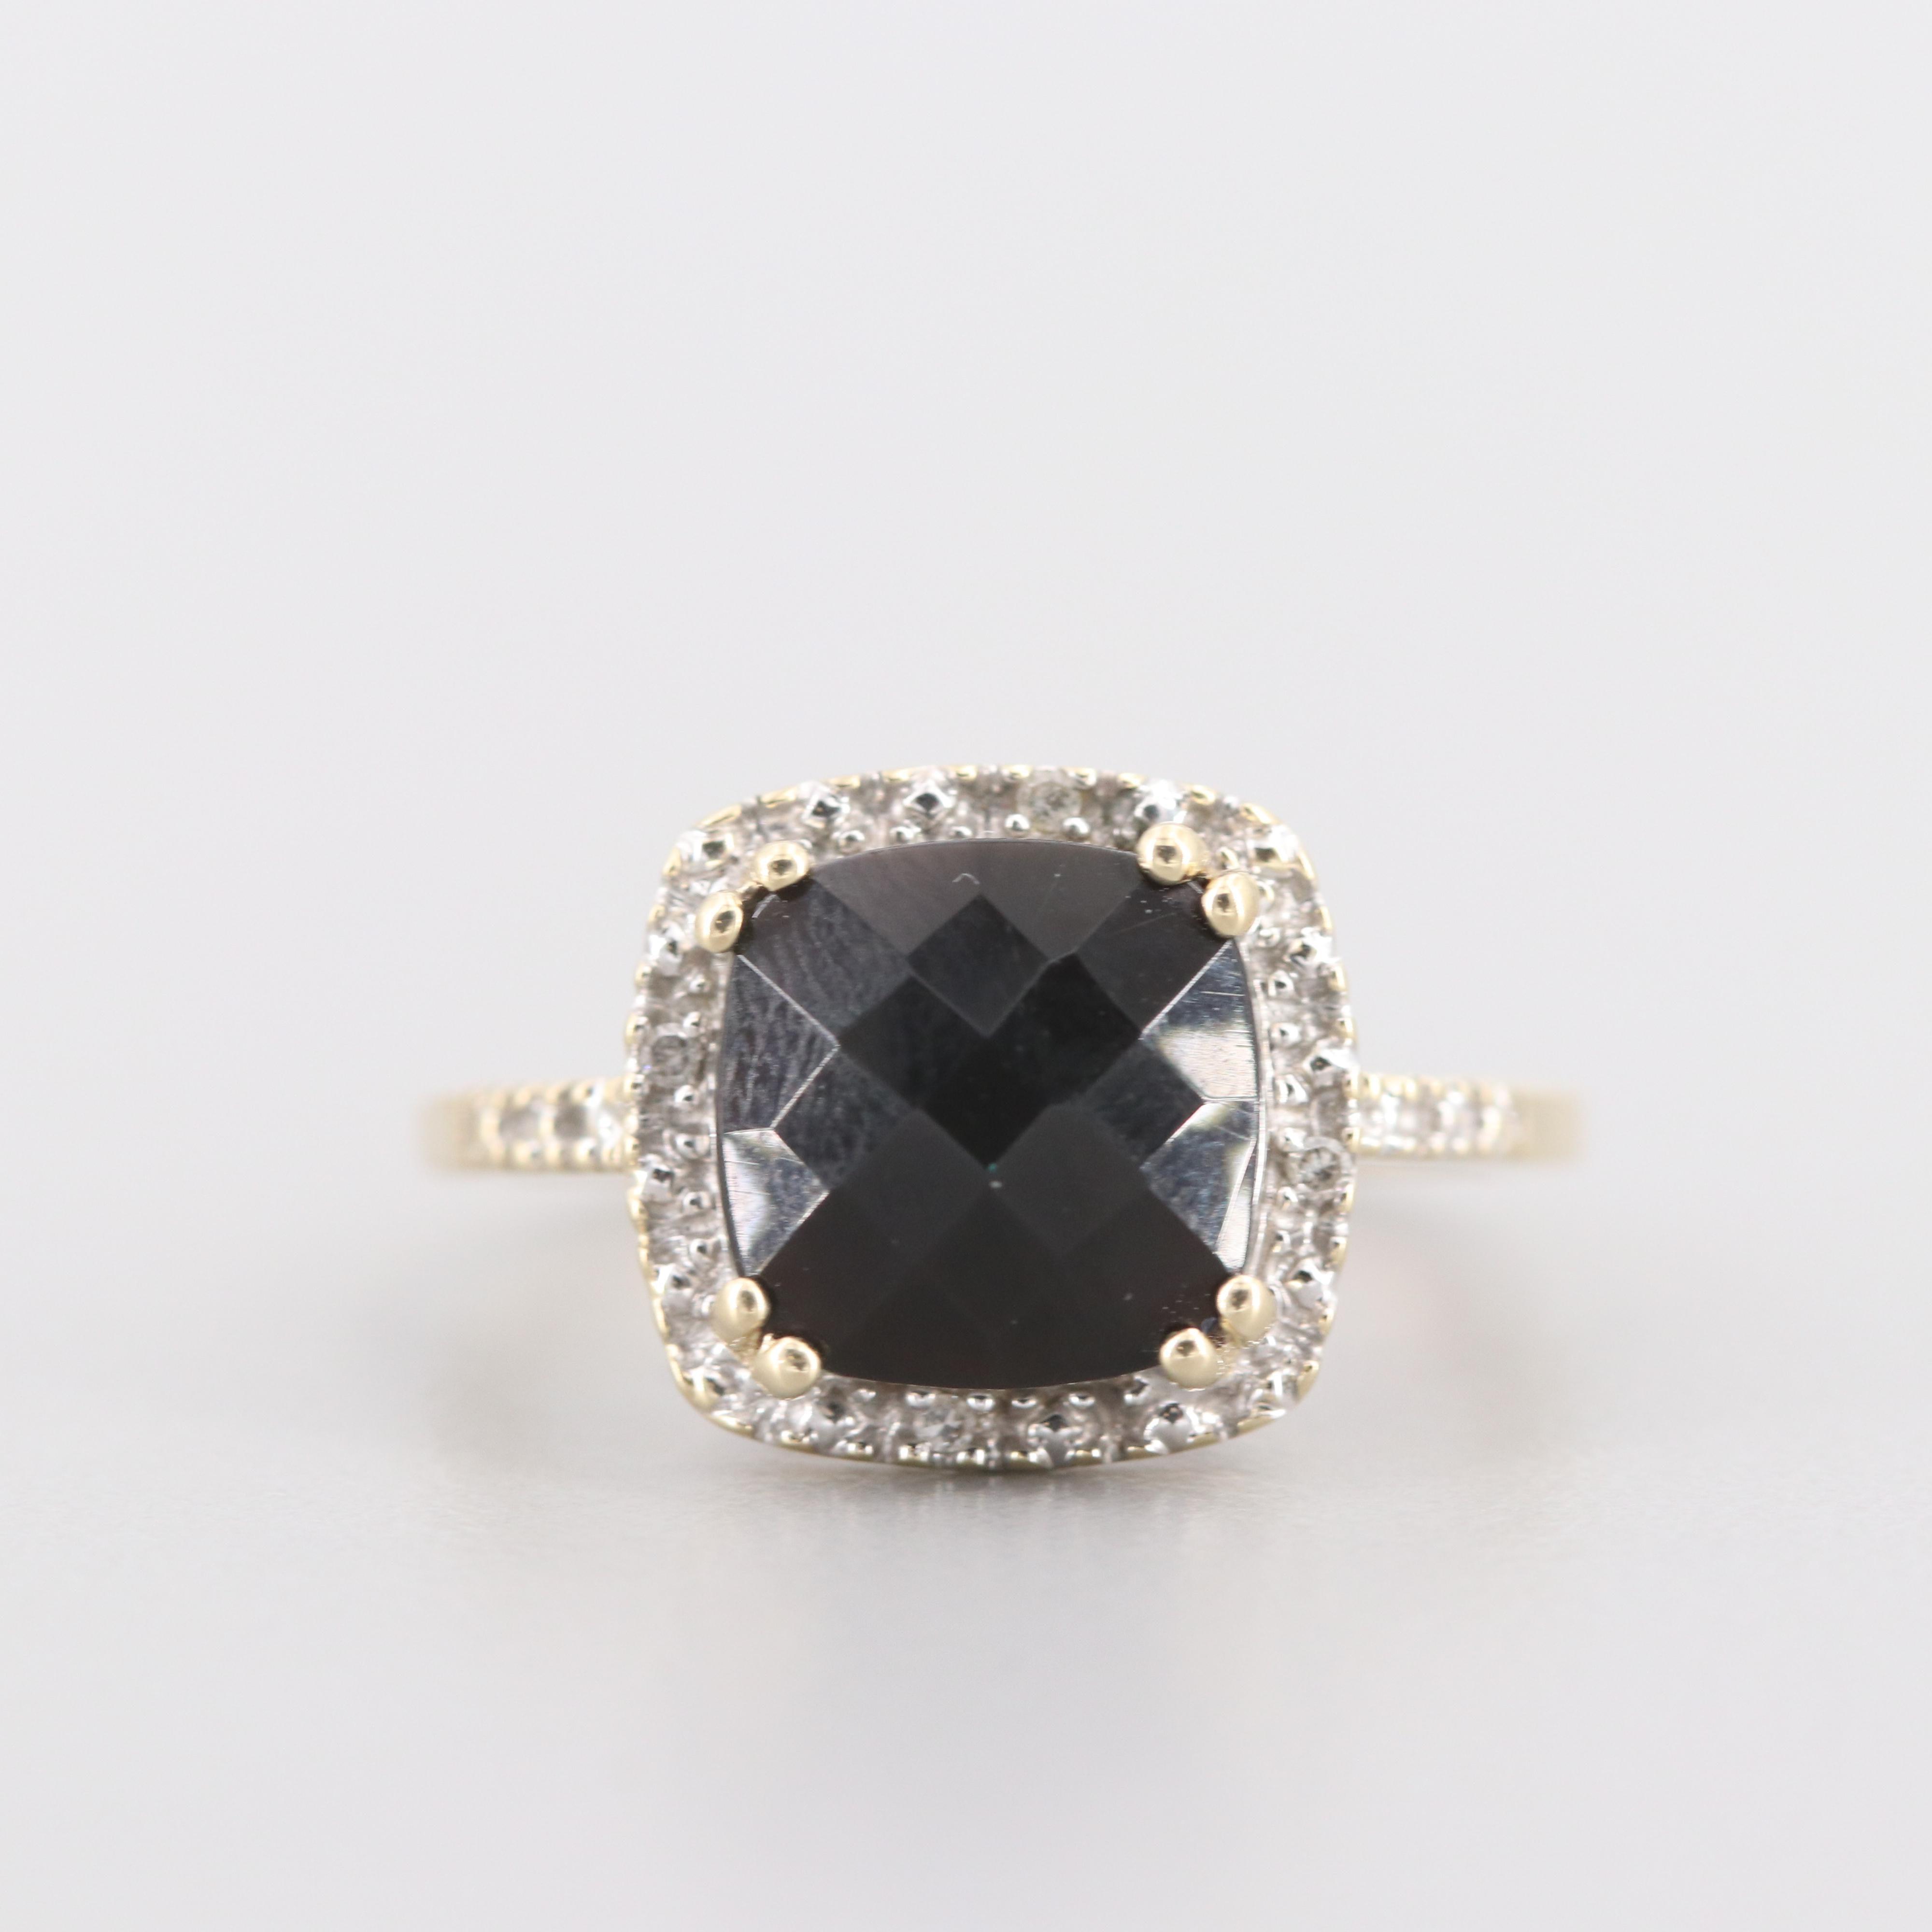 14K Yellow Gold Black Onyx and Diamond Ring